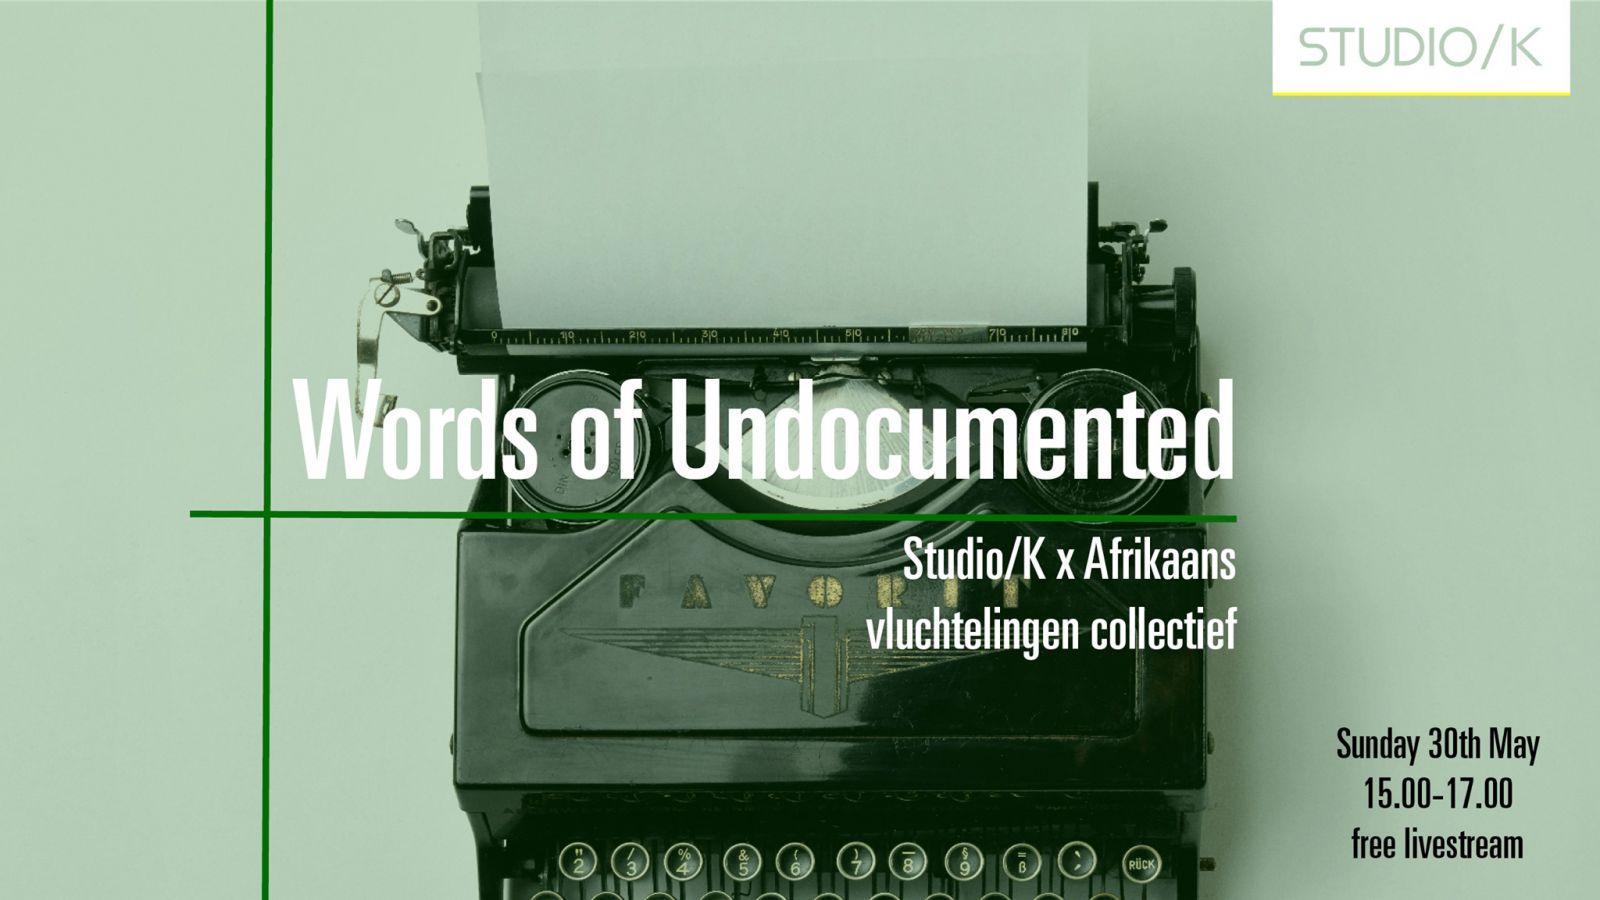 Words of Undocumented